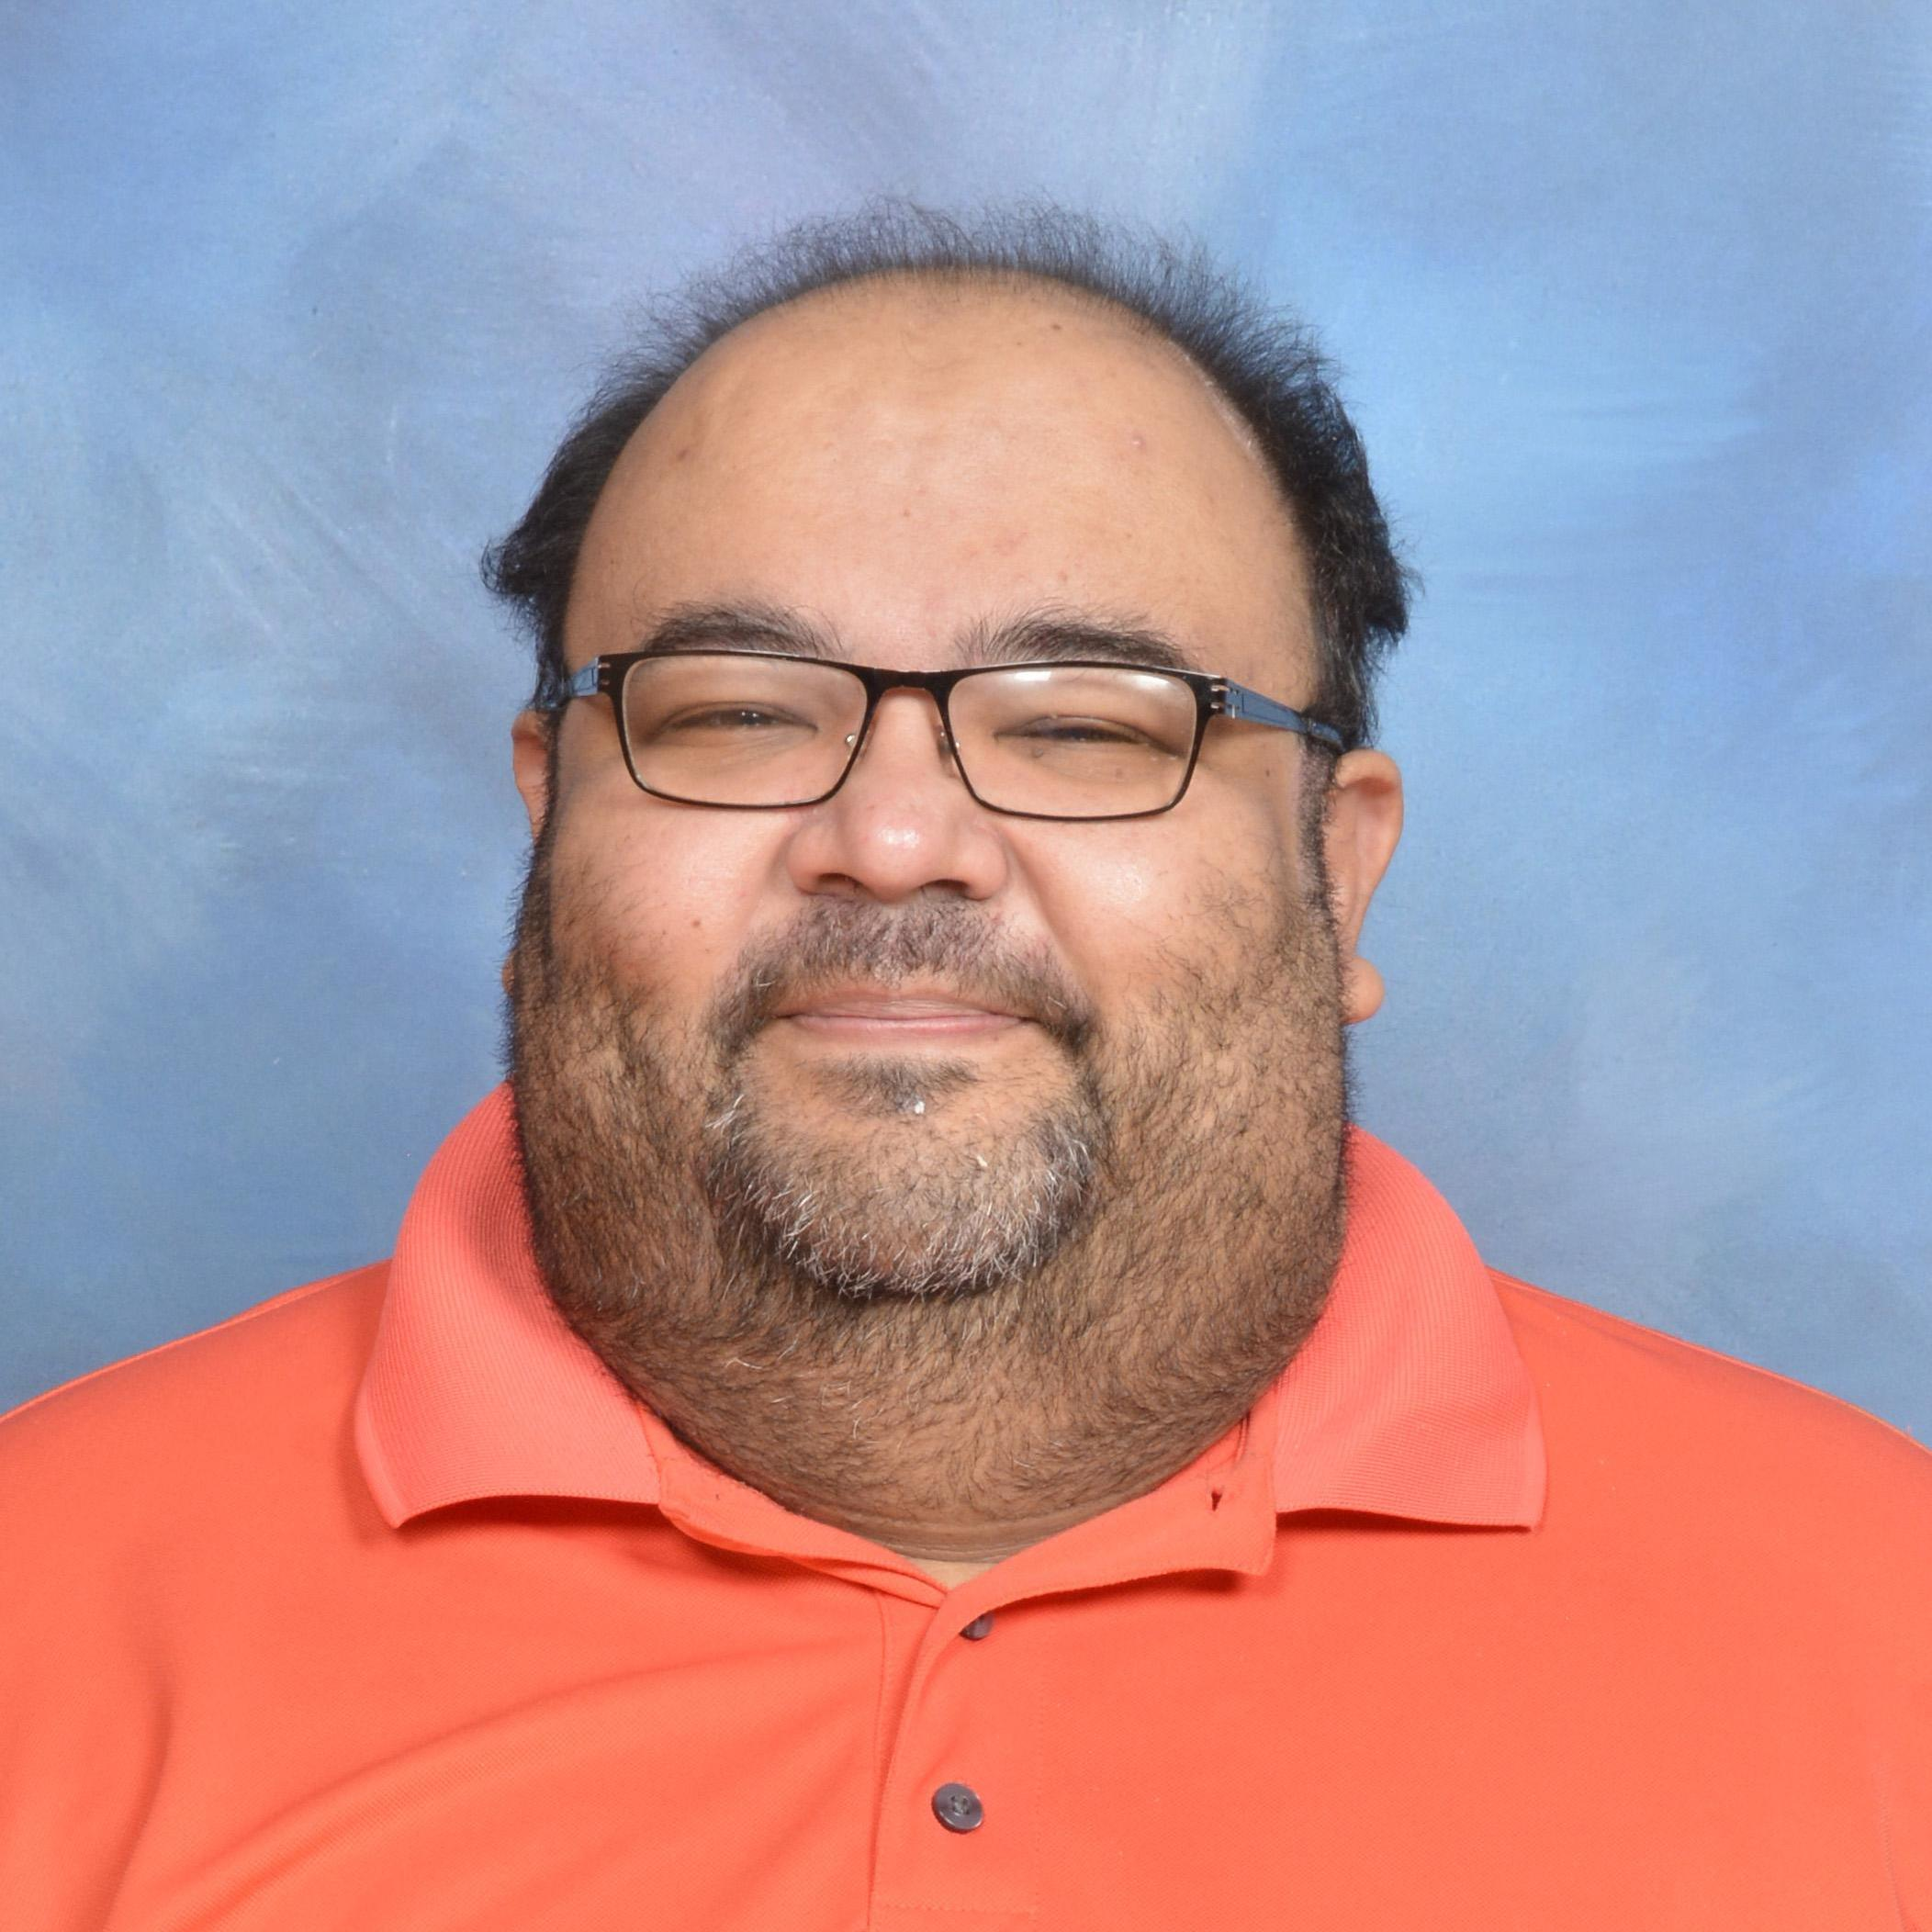 Anthony Montez's Profile Photo